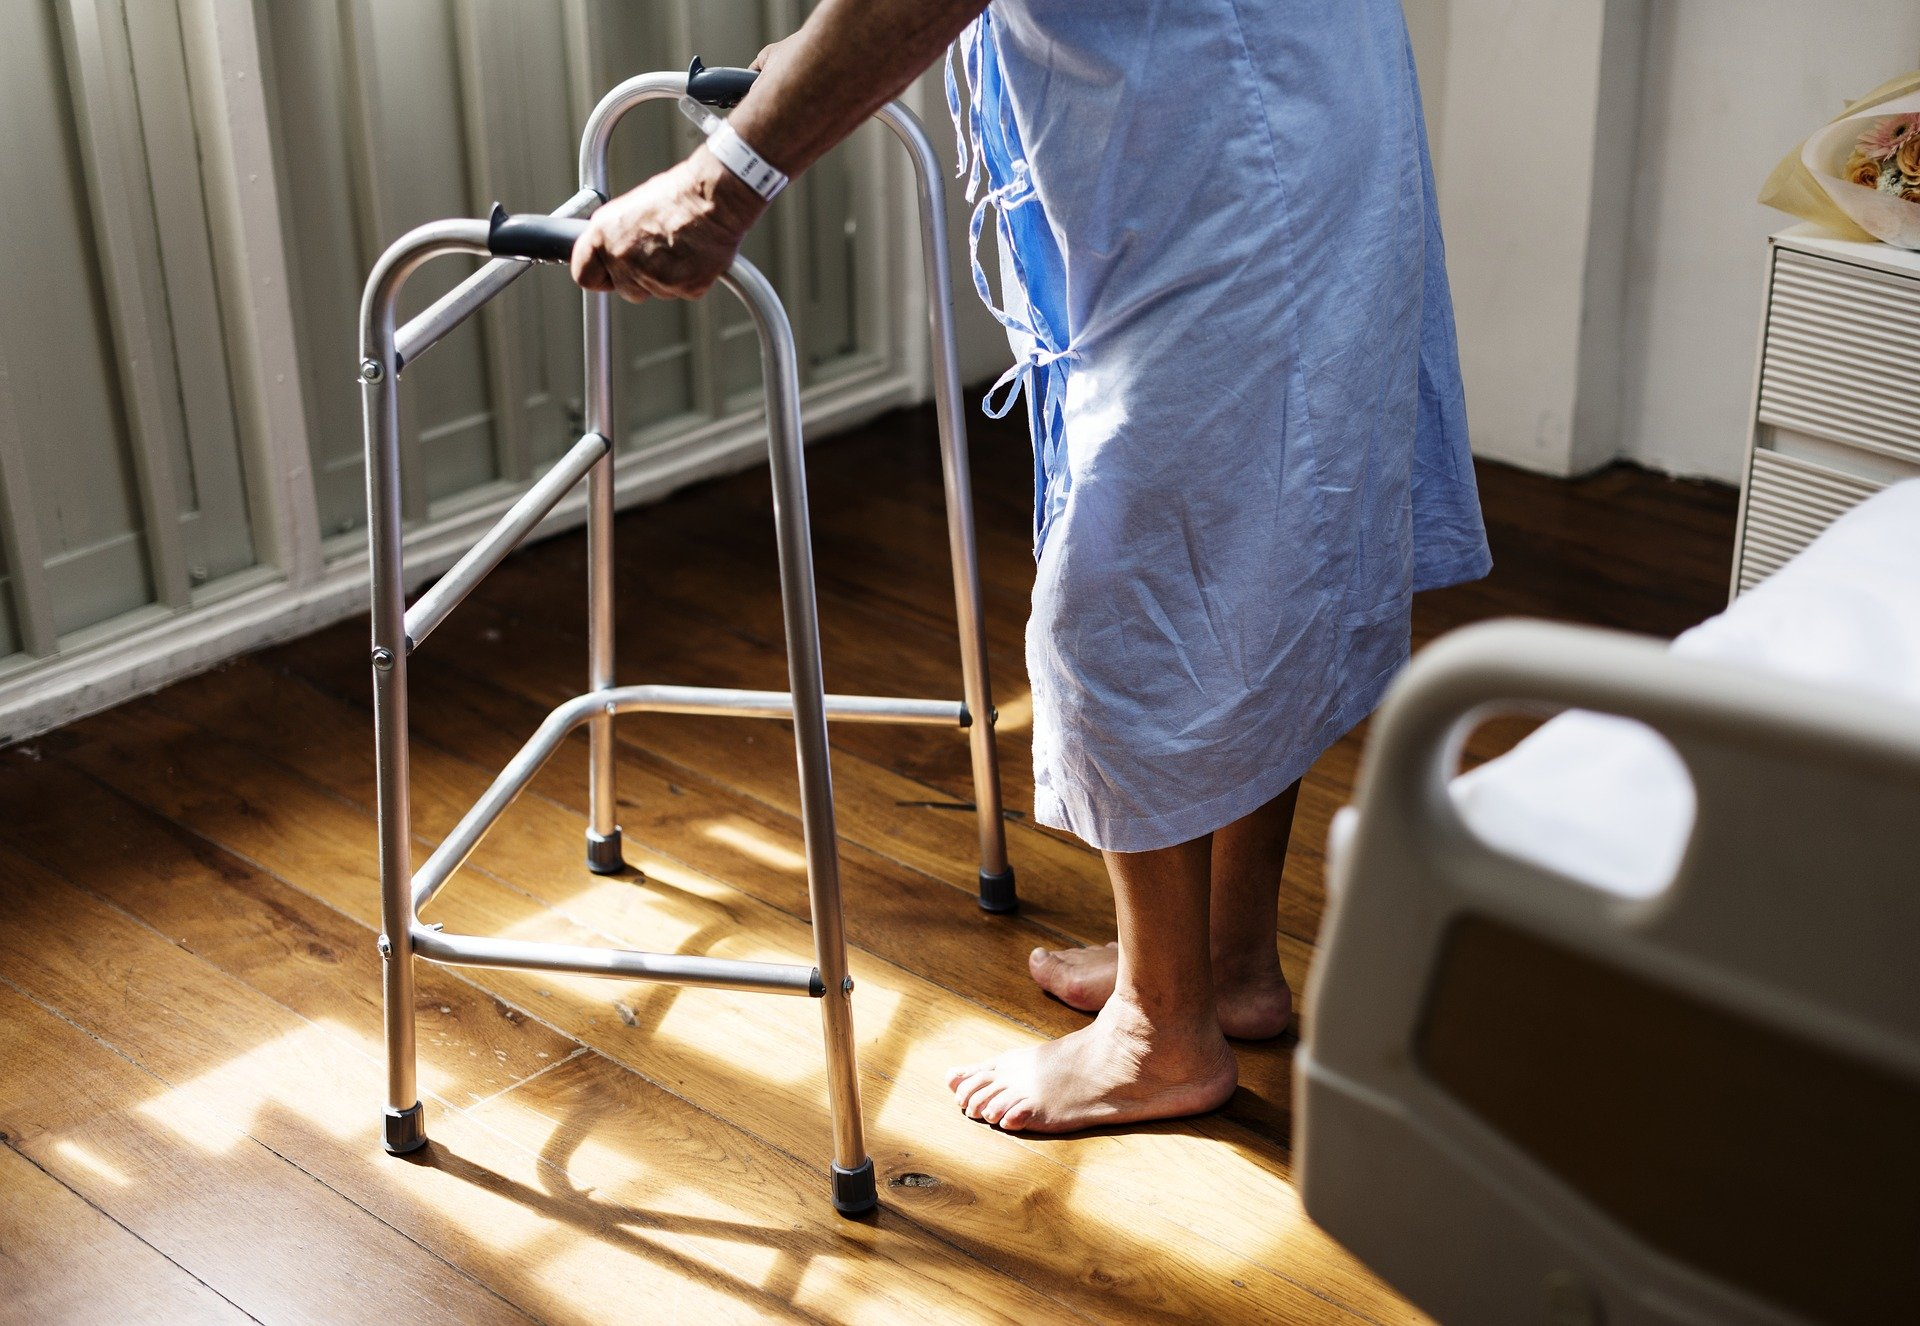 Senior man using a walker.   Source: rawpixel/Pixabay